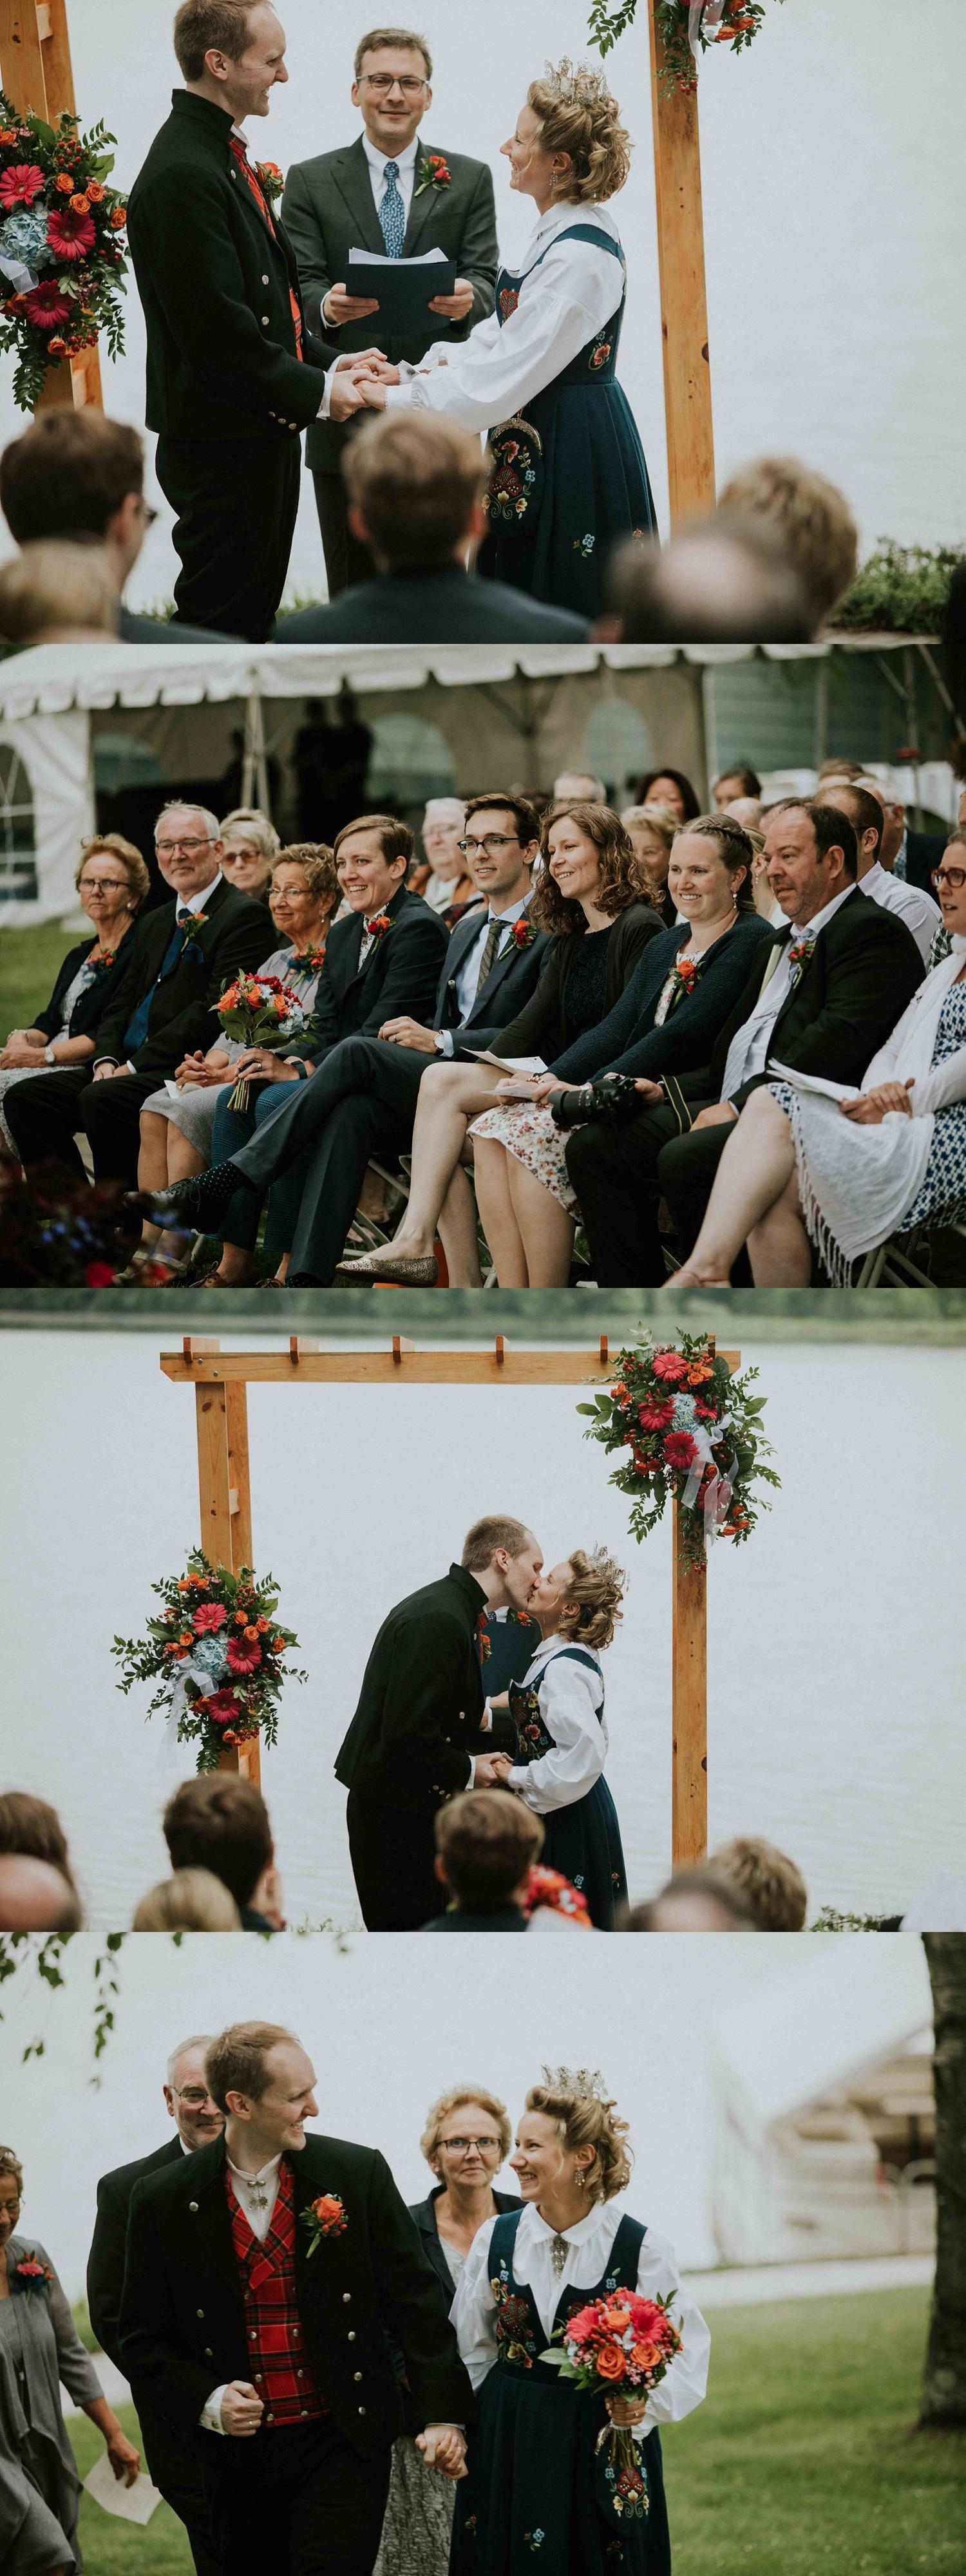 Norwegian Wedding Stevens Point Wisconsin Wedding Photographer Chloe Ann Photography_0017.jpg